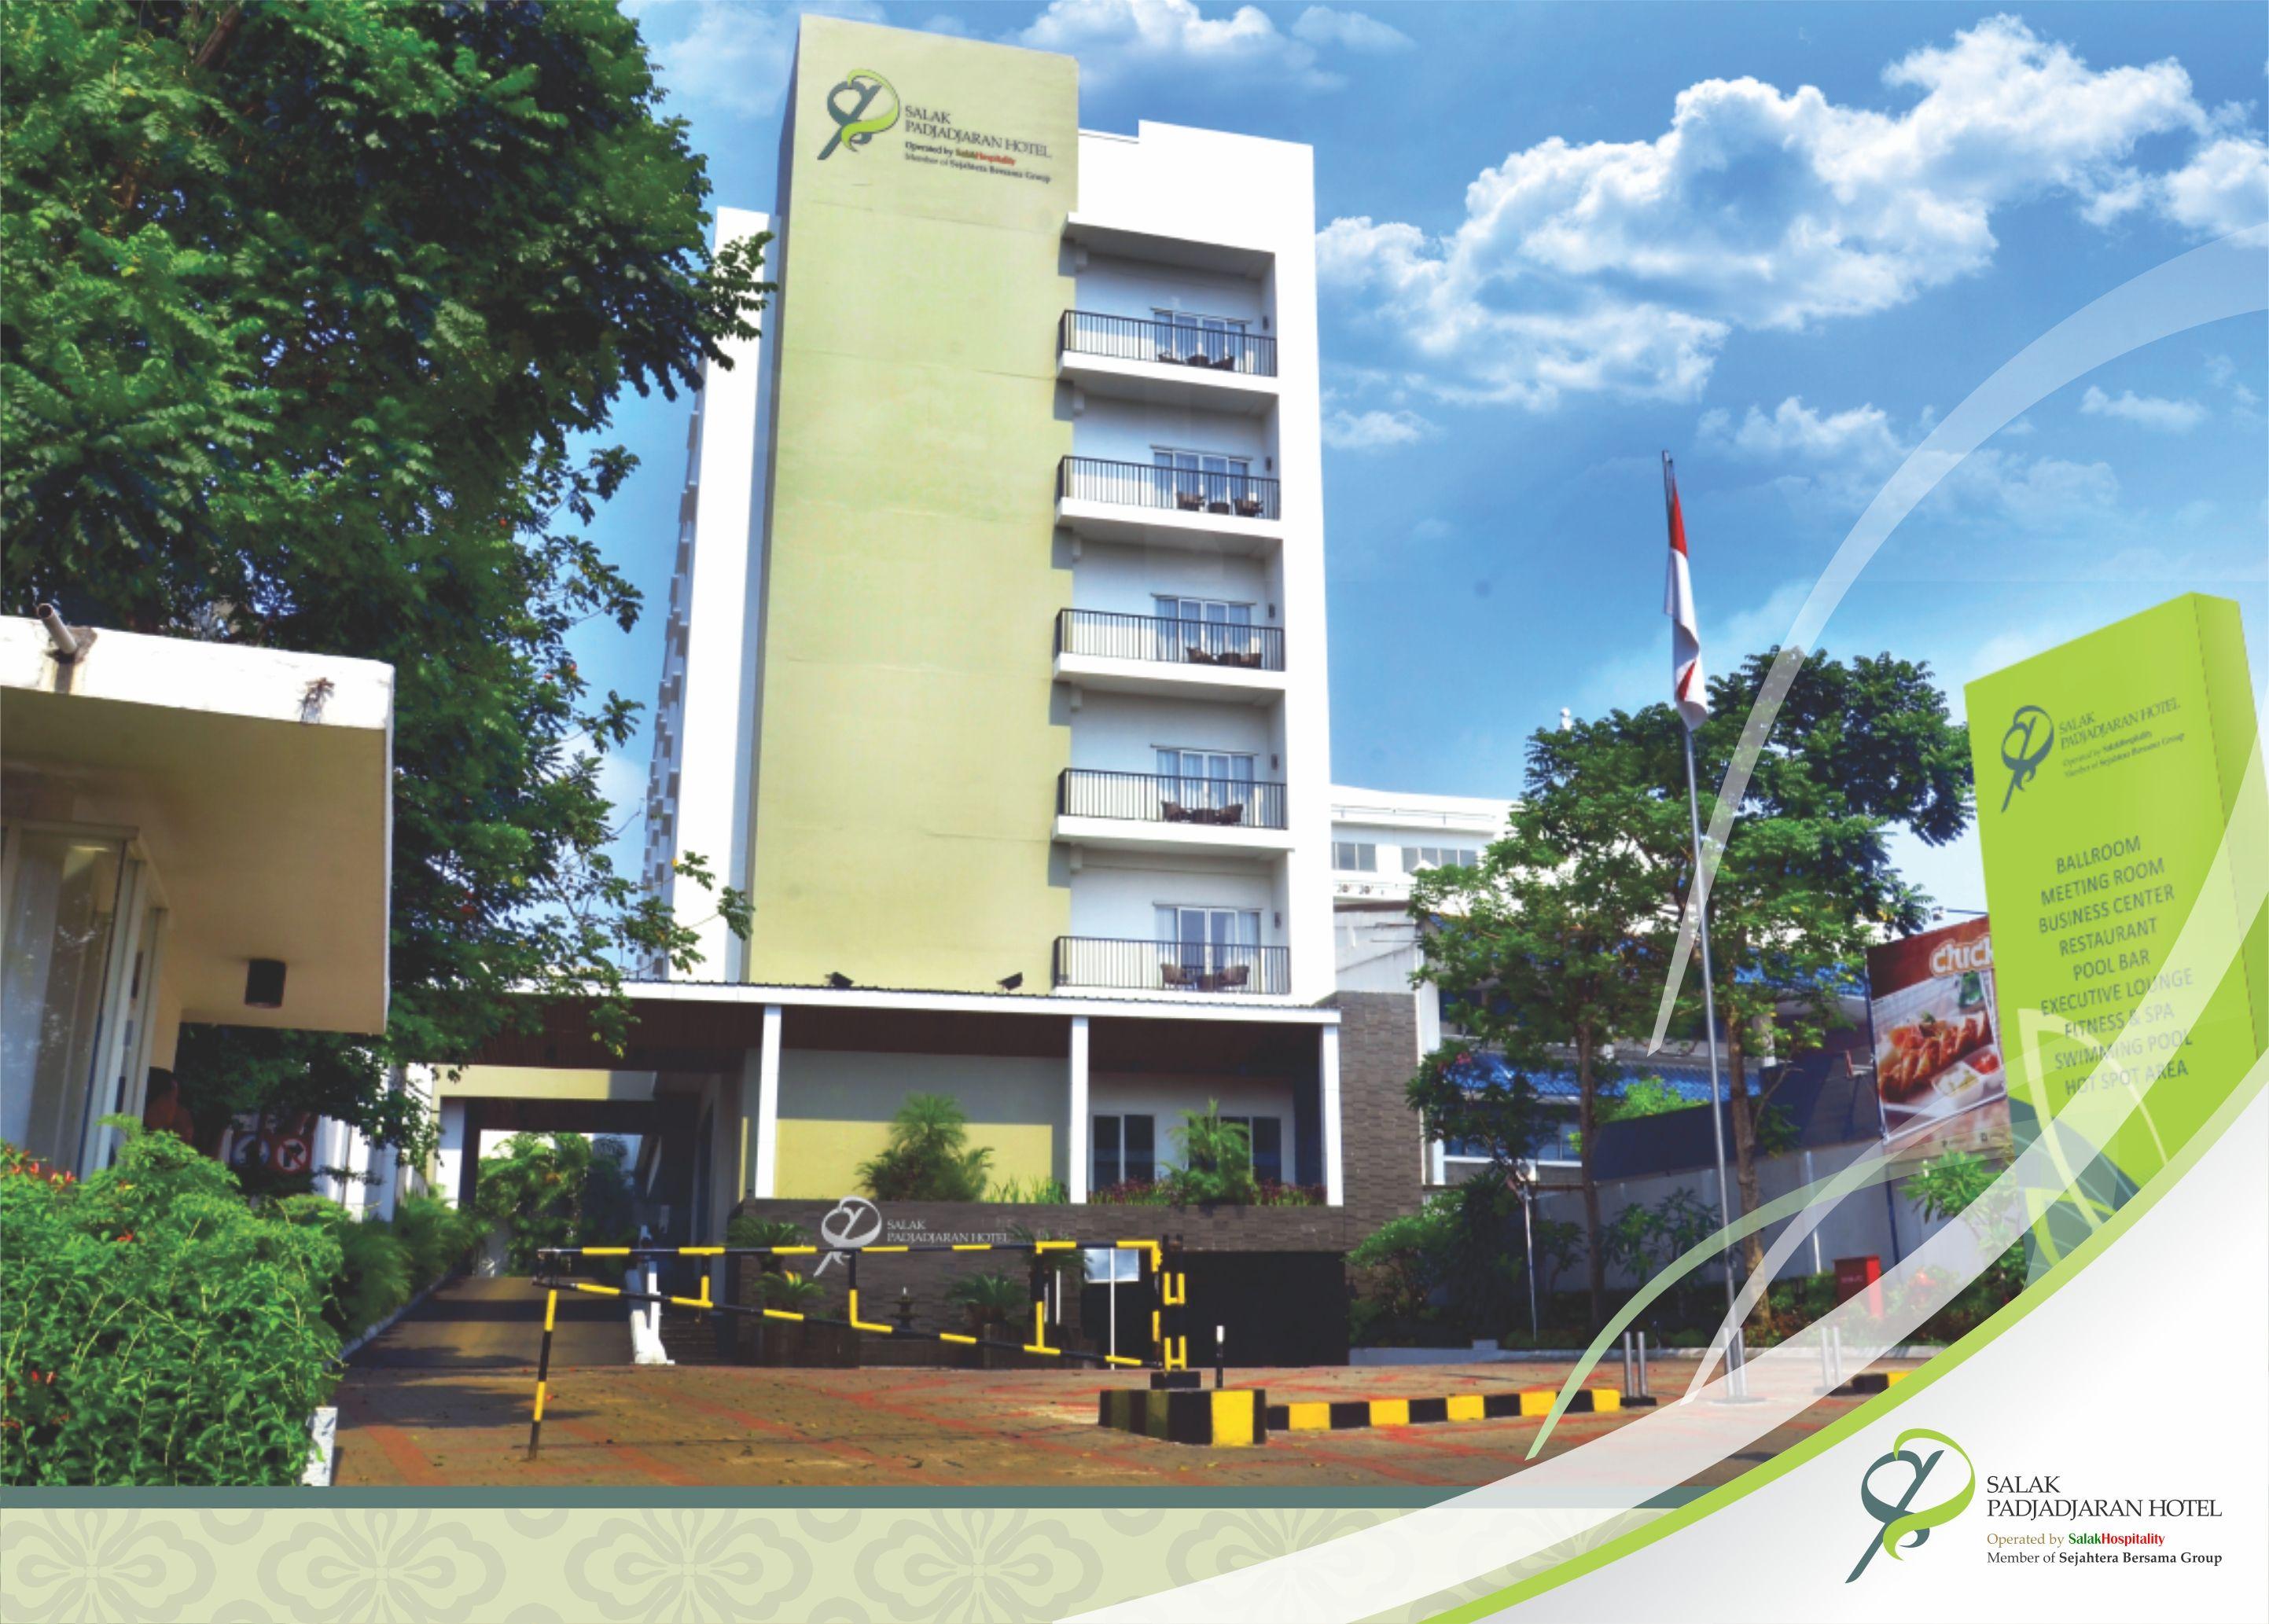 Salak Padjadjaran Hotel (Formerly Padjadjaran Suites Hotel)